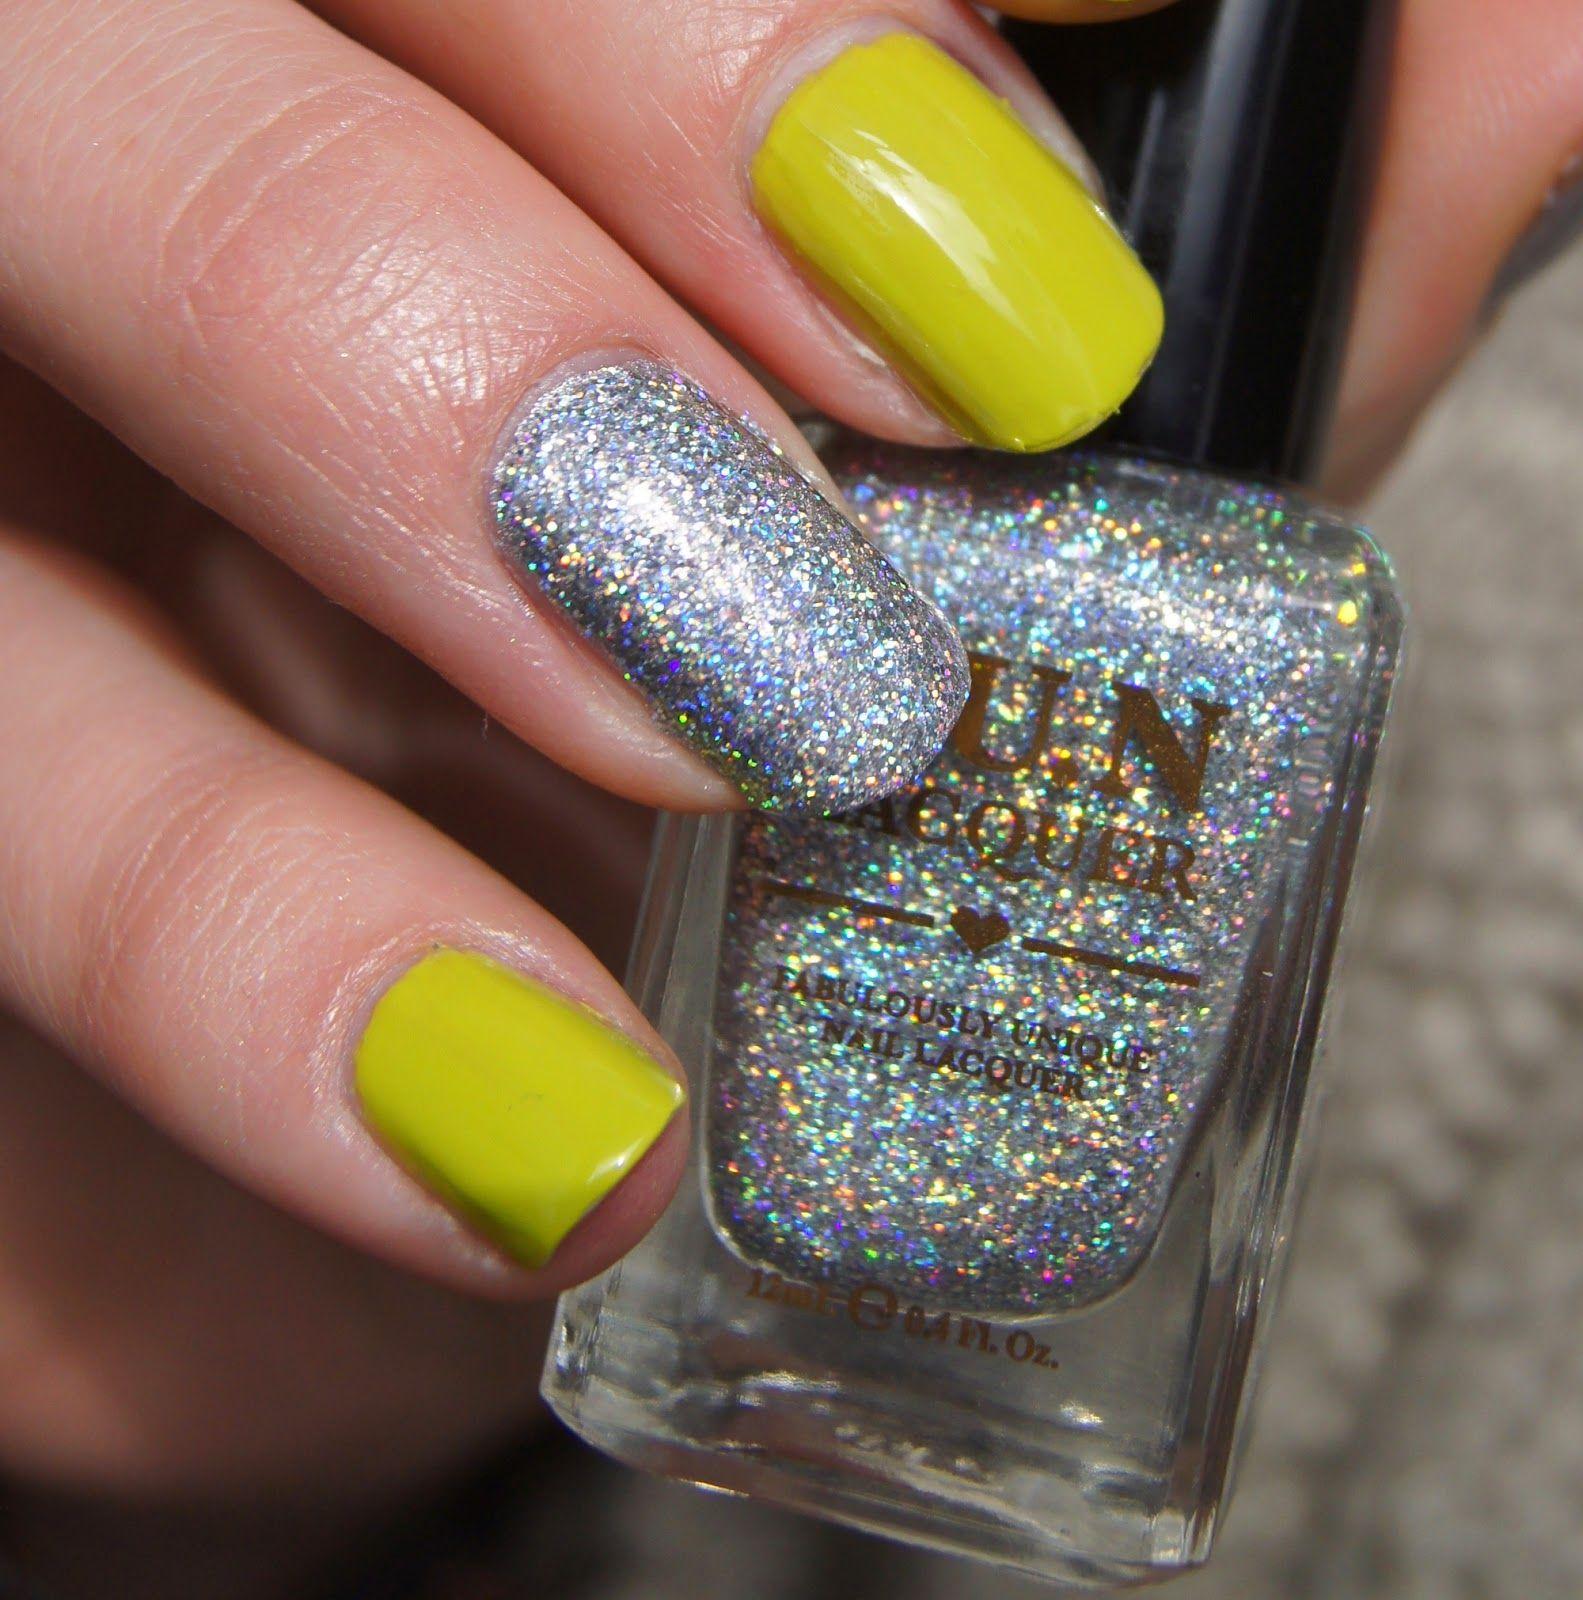 nail art green glitter stamping nails | Passion for nails! | Pinterest